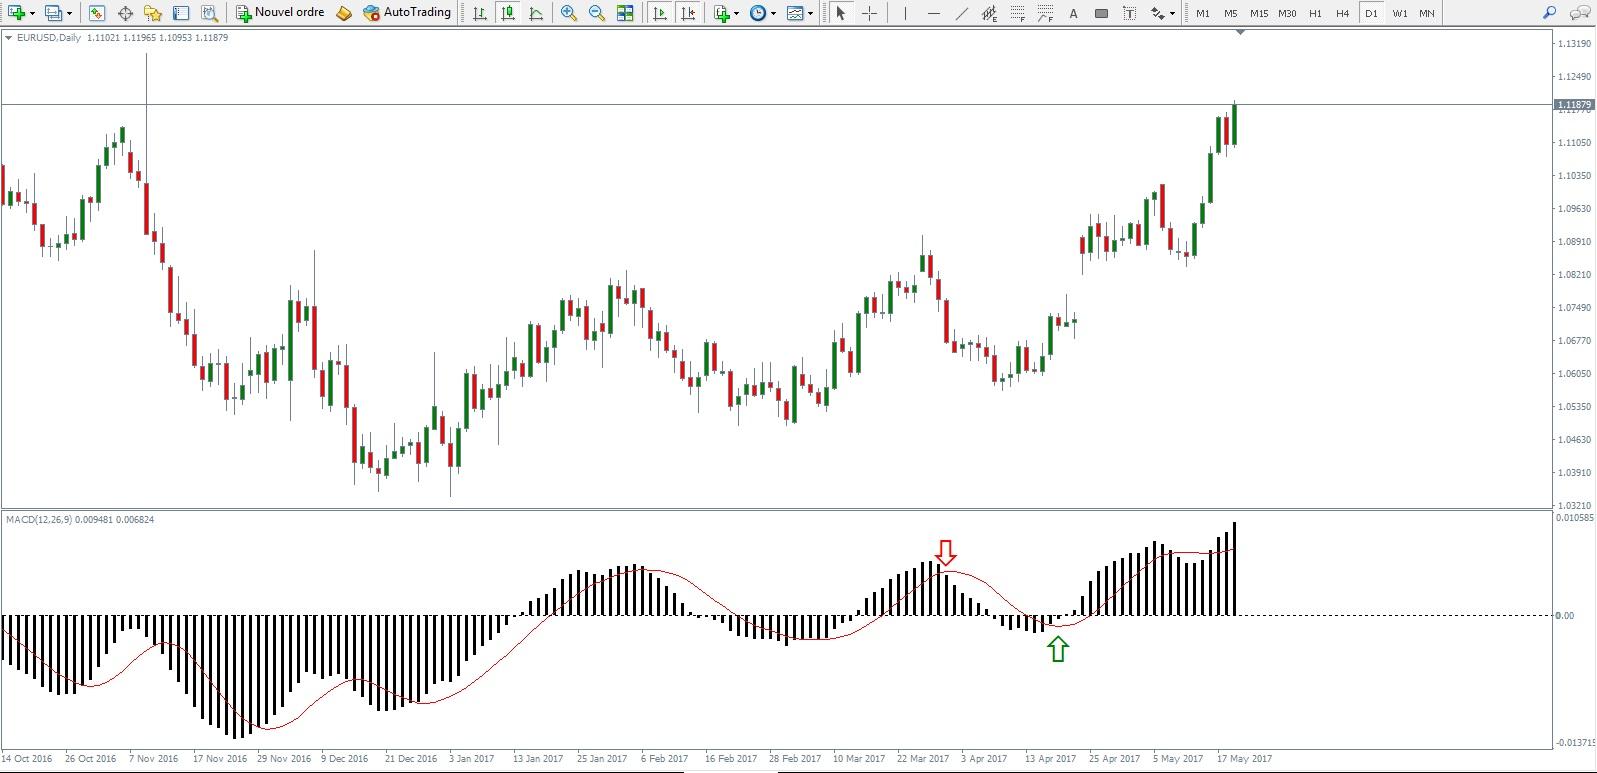 macd indicatore trading